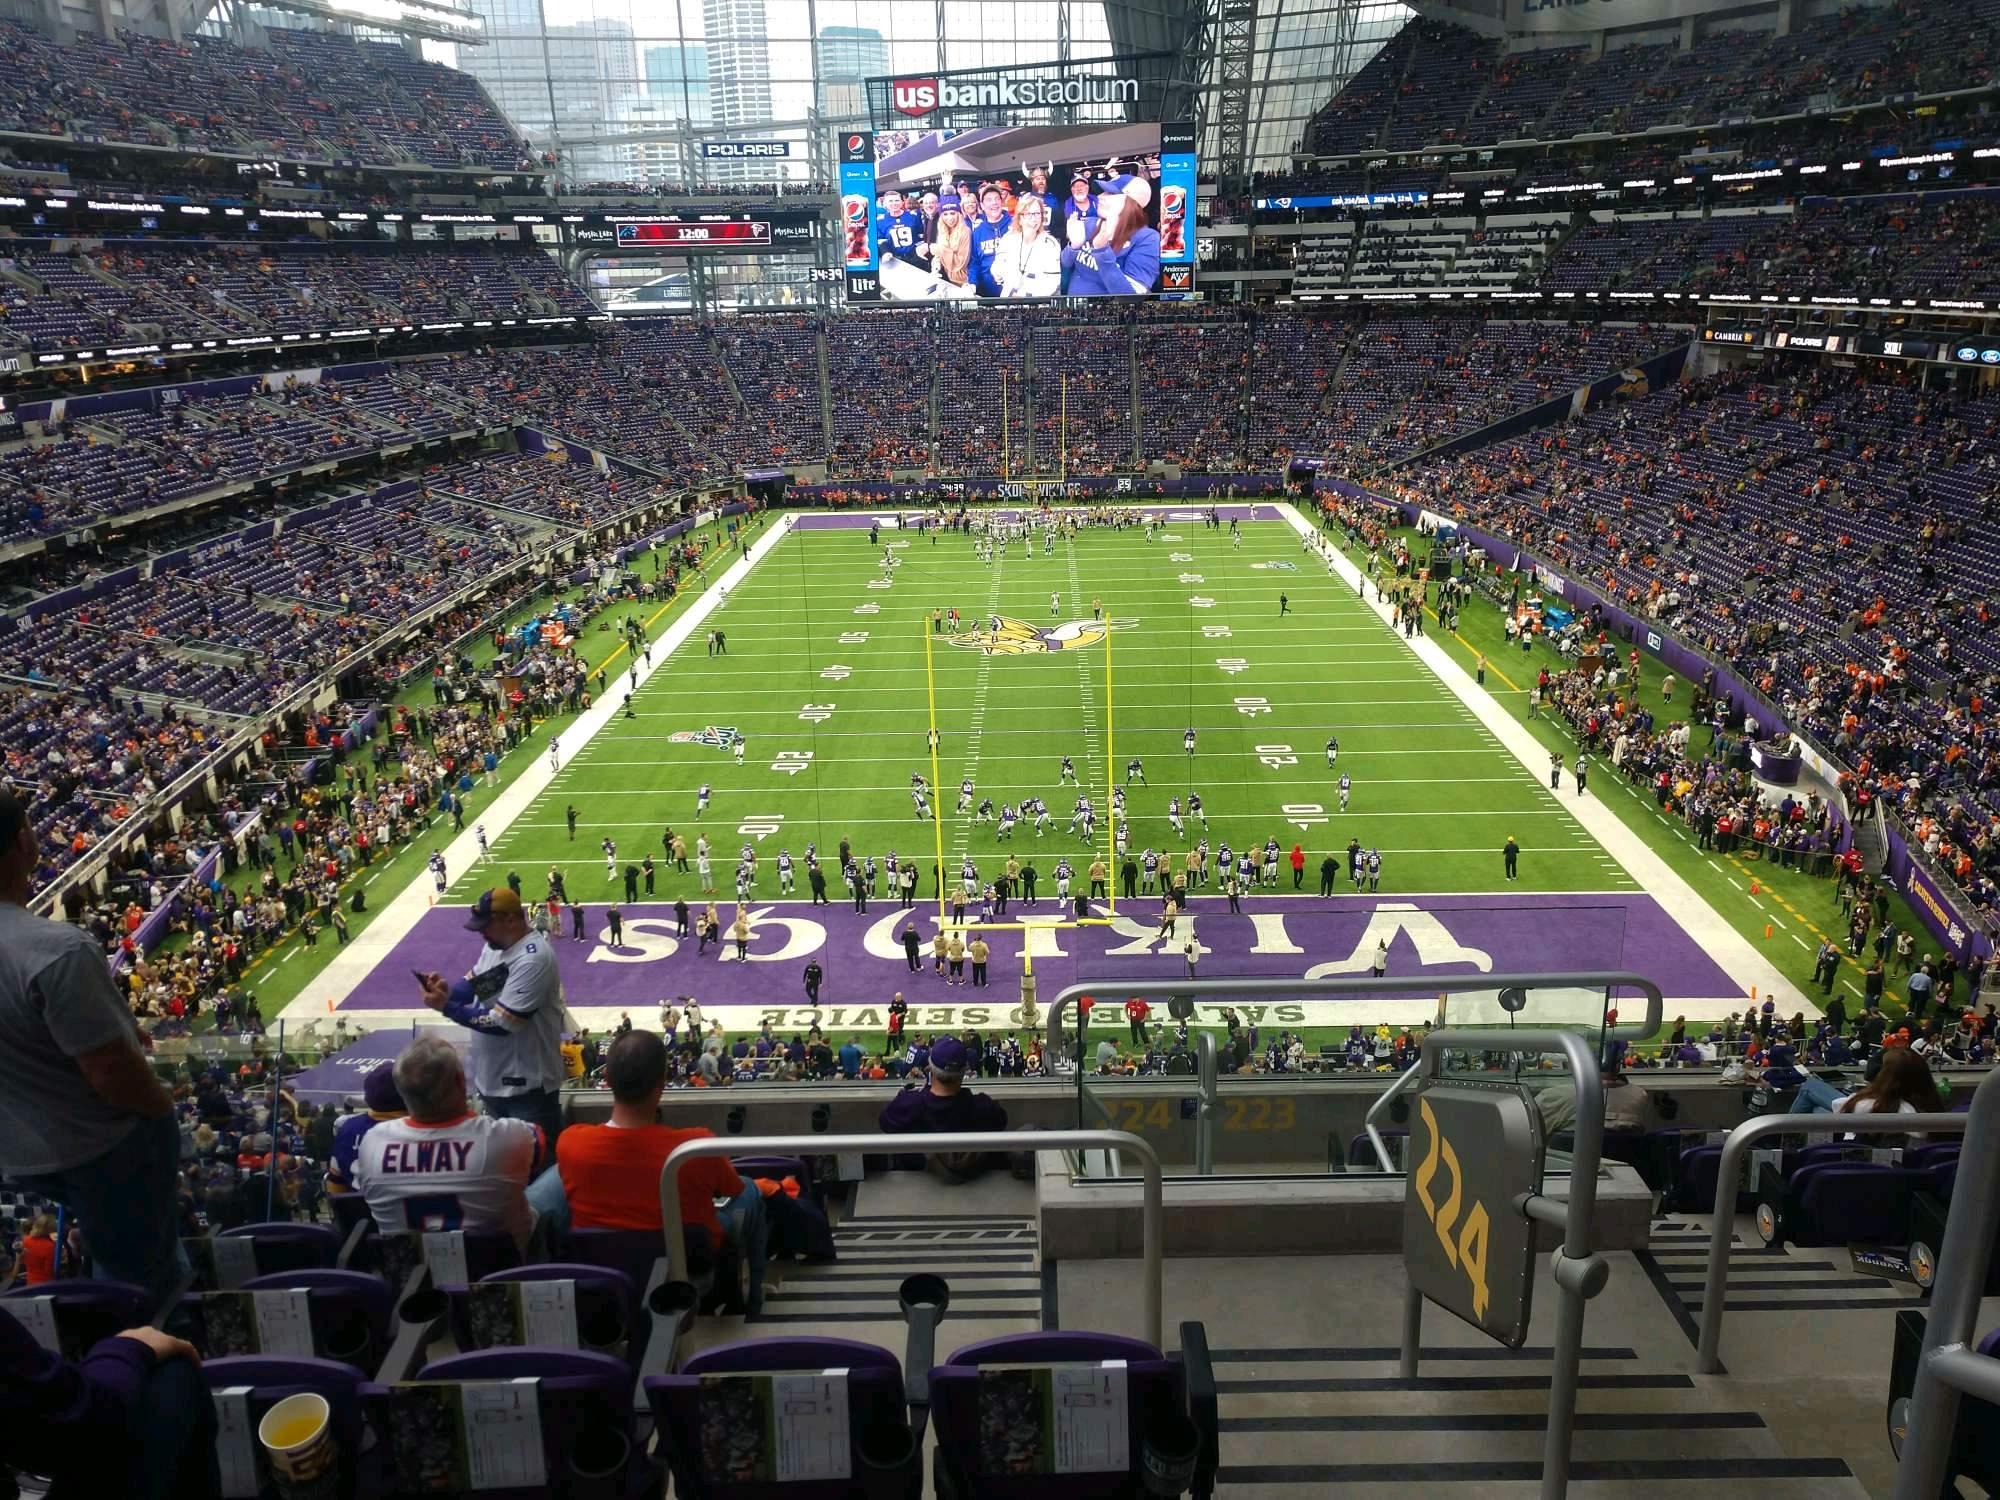 U.S. Bank Stadium Section 224 Row 9 Seat 1